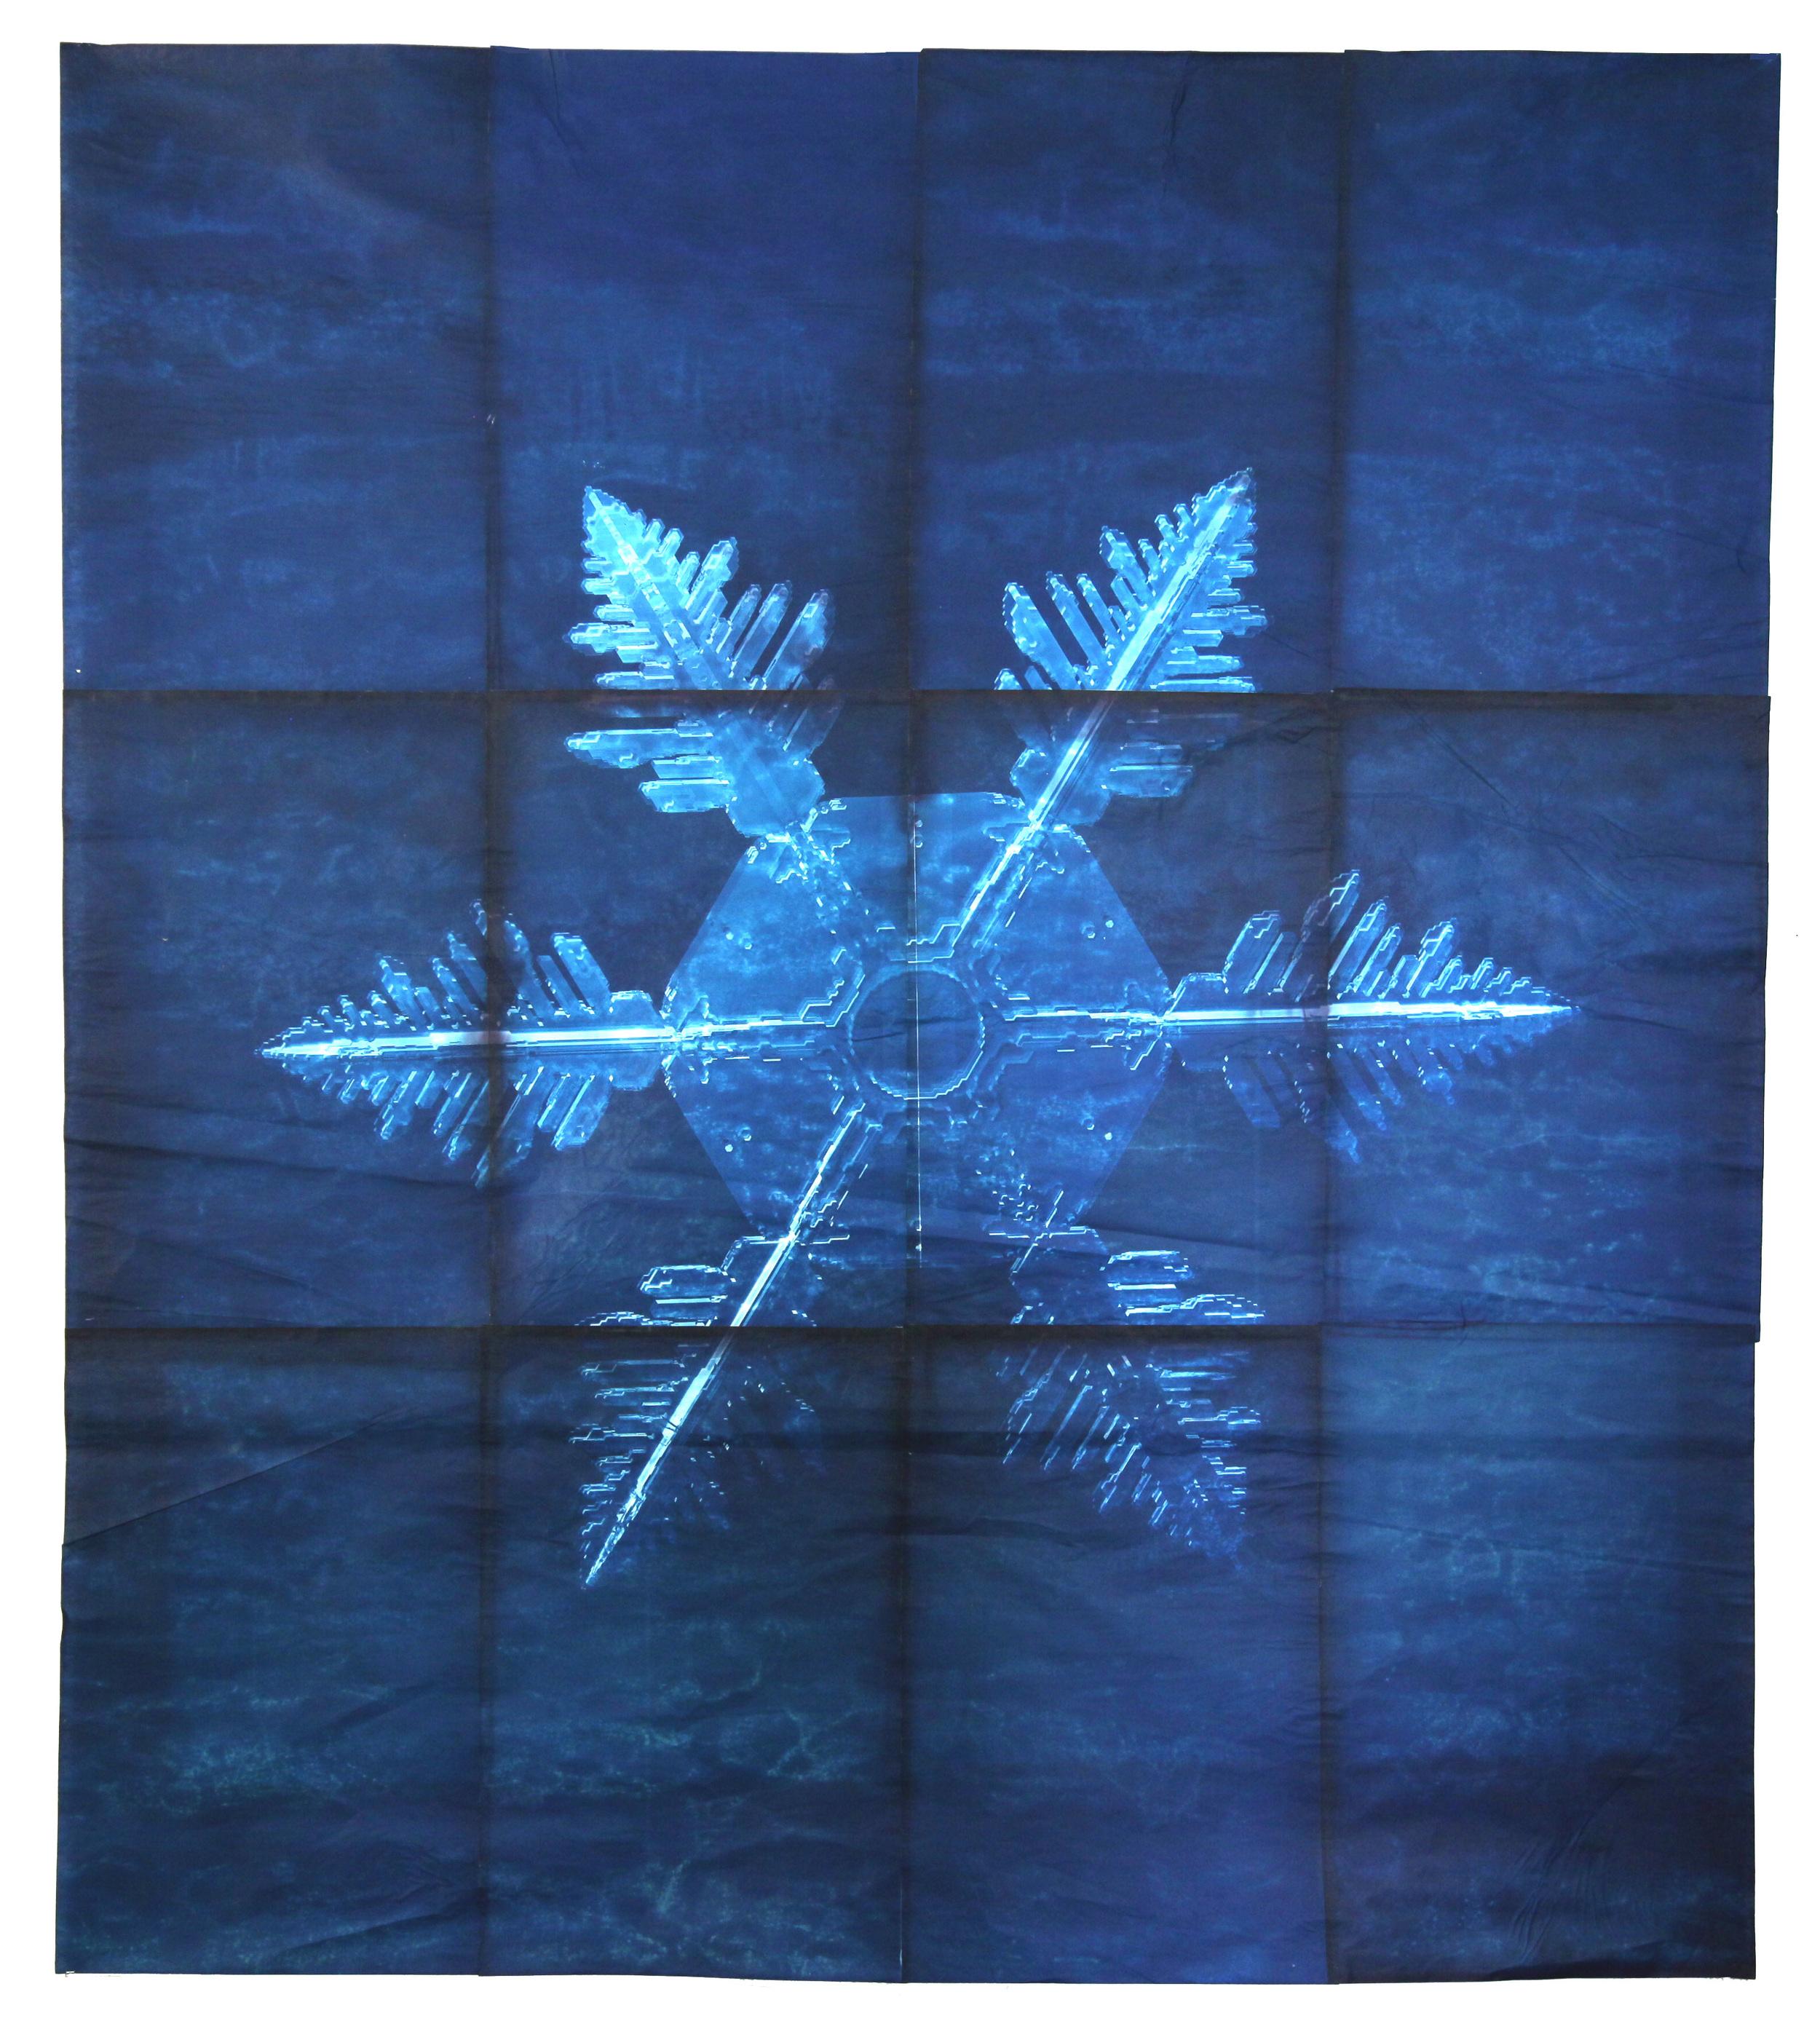 Snowflake #4, 2011